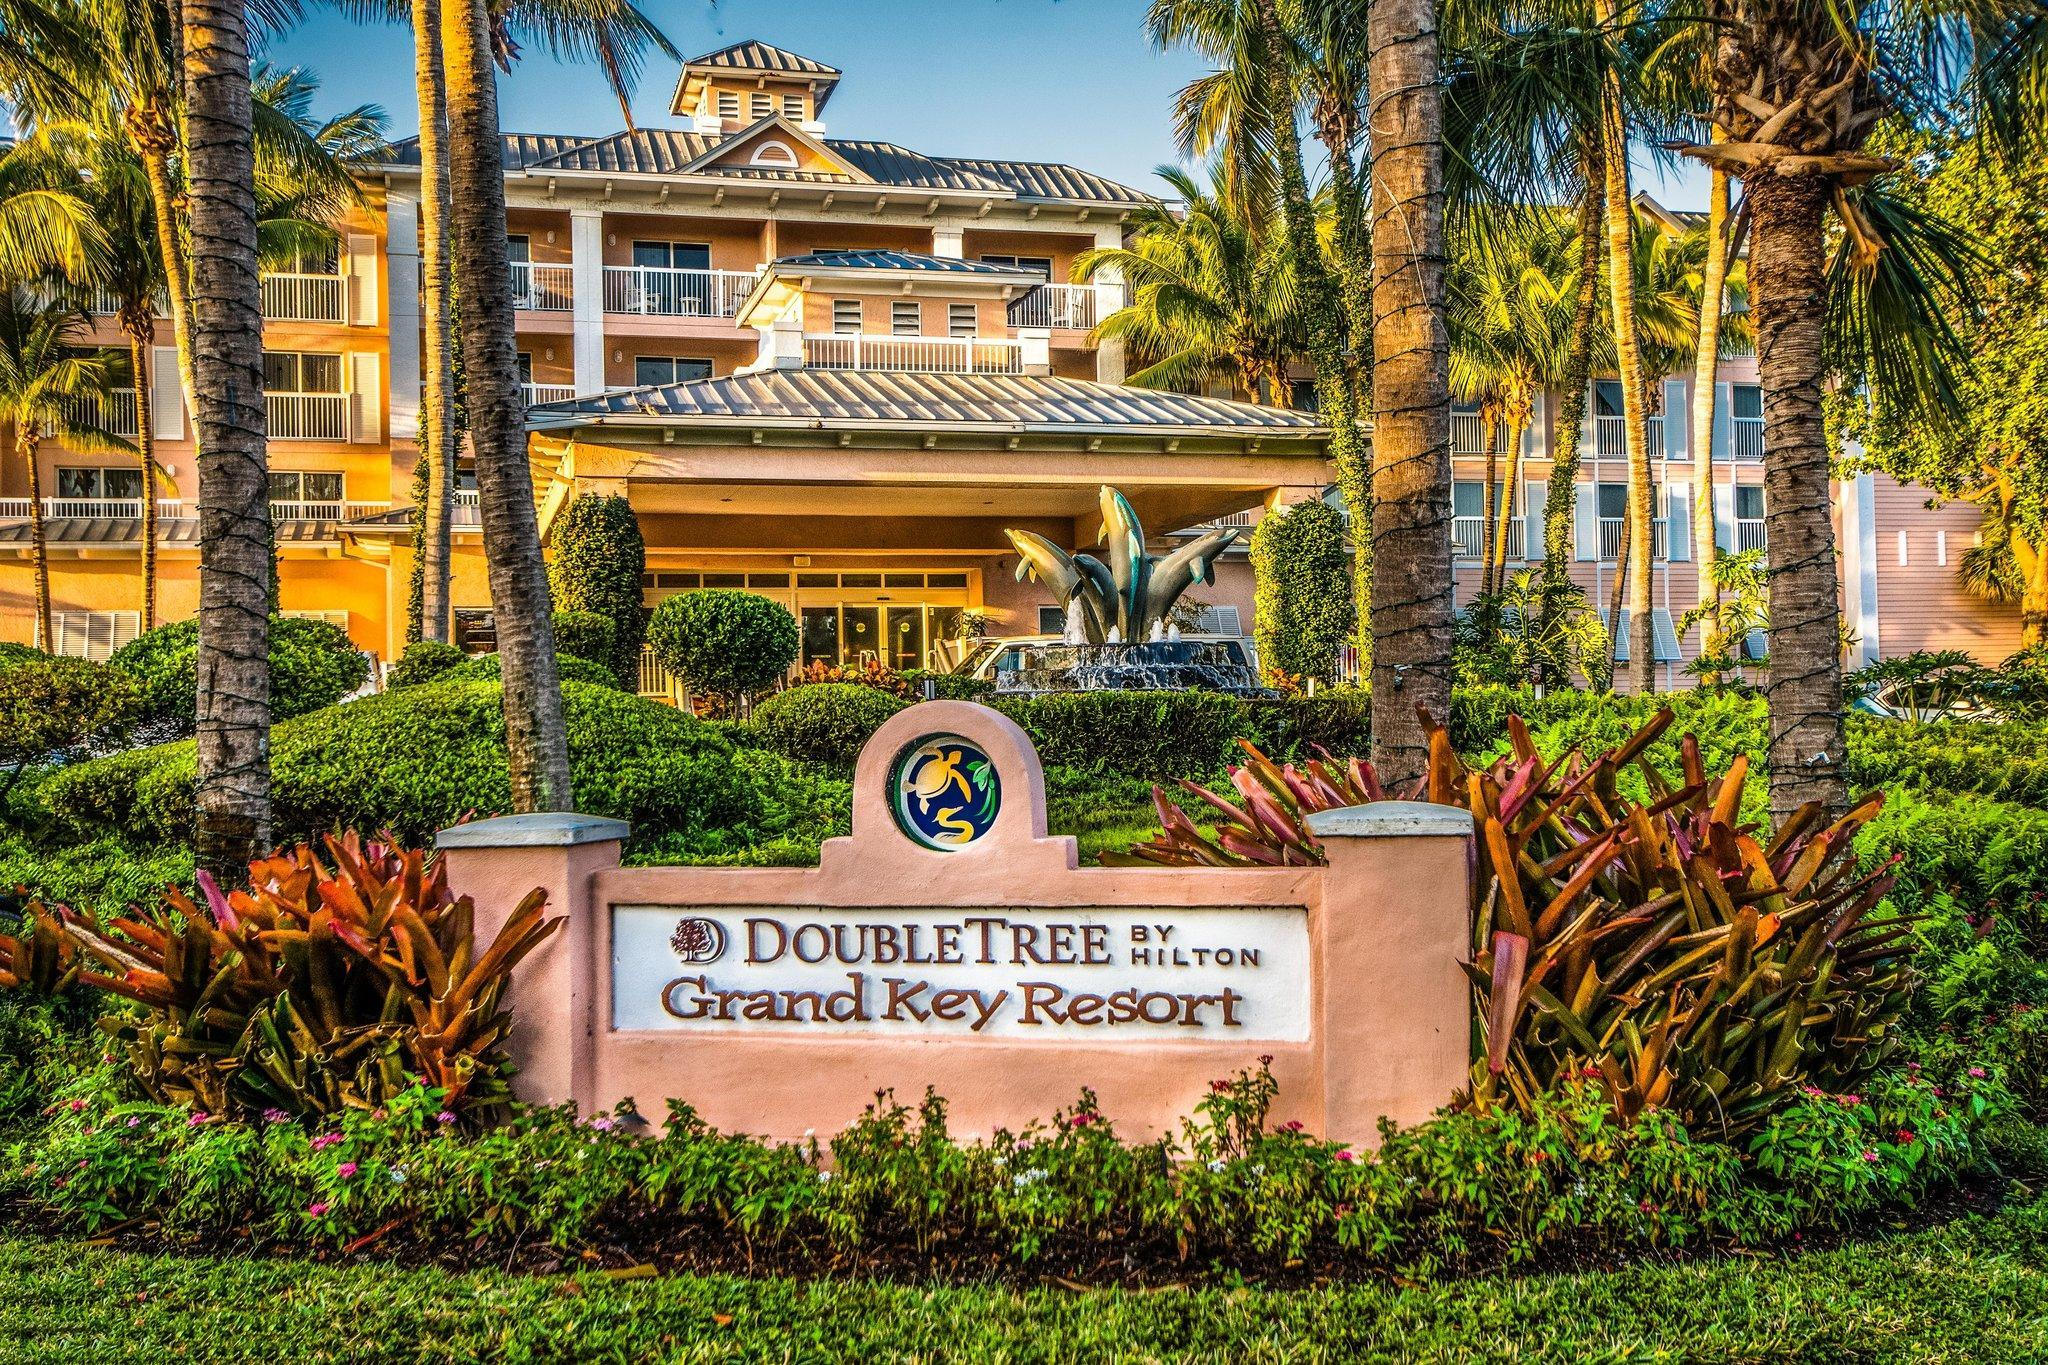 DoubleTree By Hilton Key West Grand Key Resort